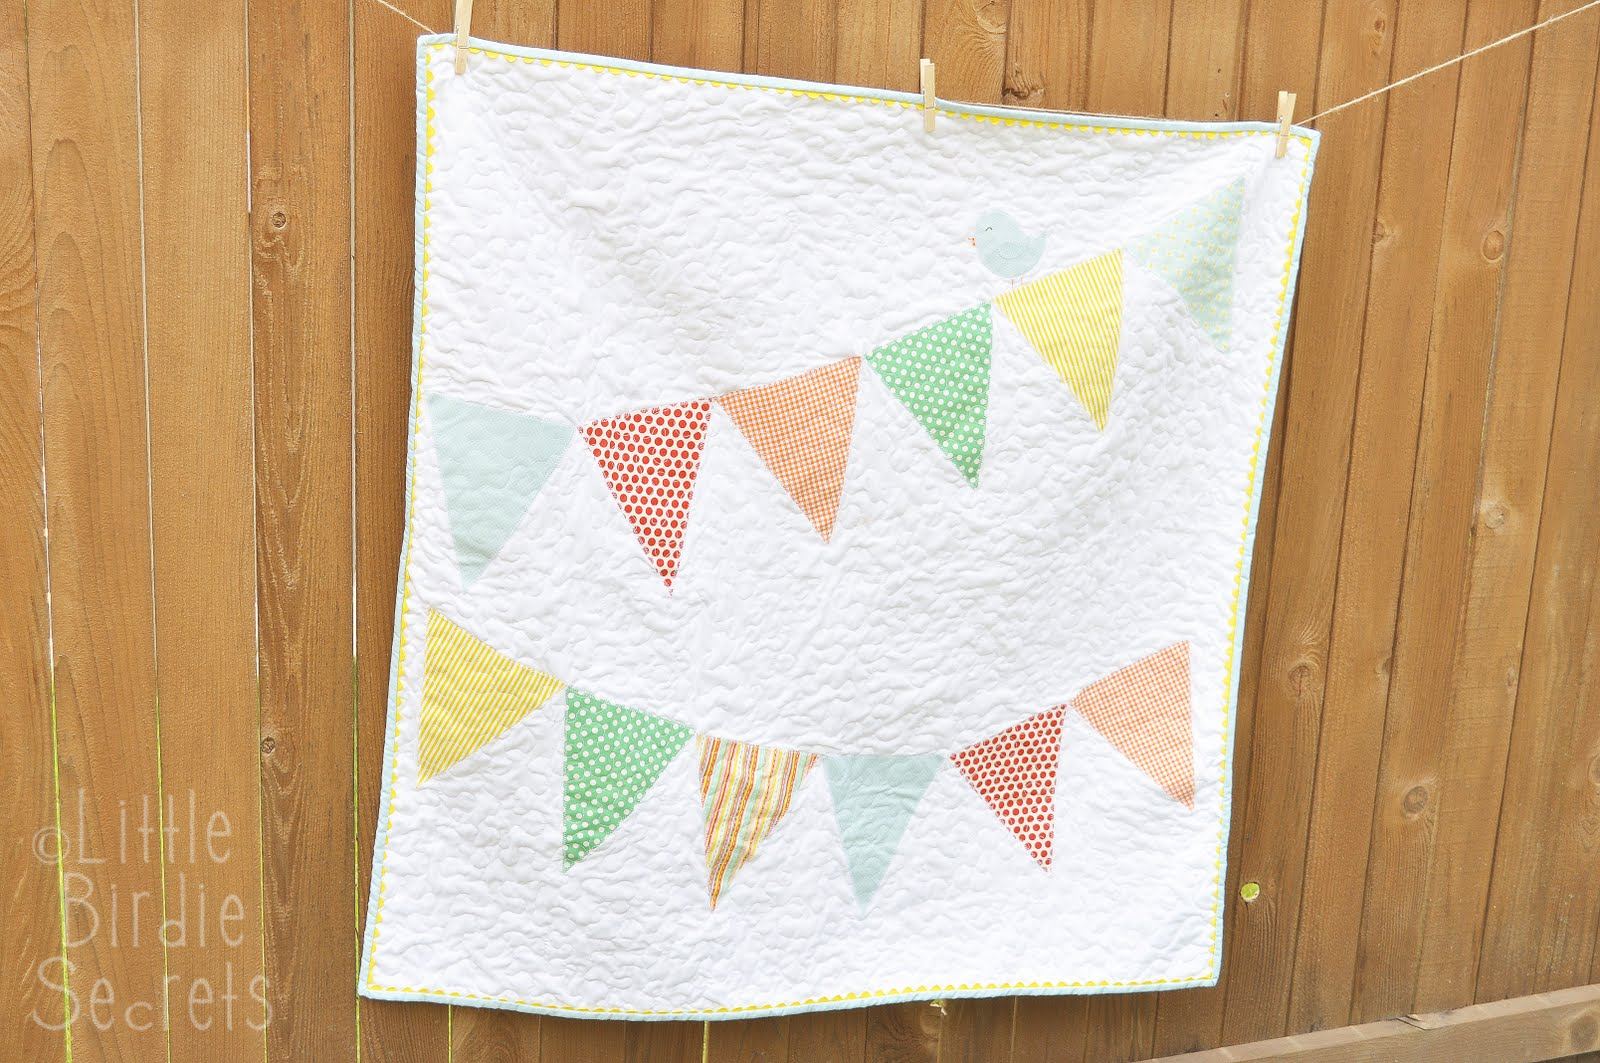 baby bunting banner quilt | Little Birdie Secrets : quilted baby bunting - Adamdwight.com